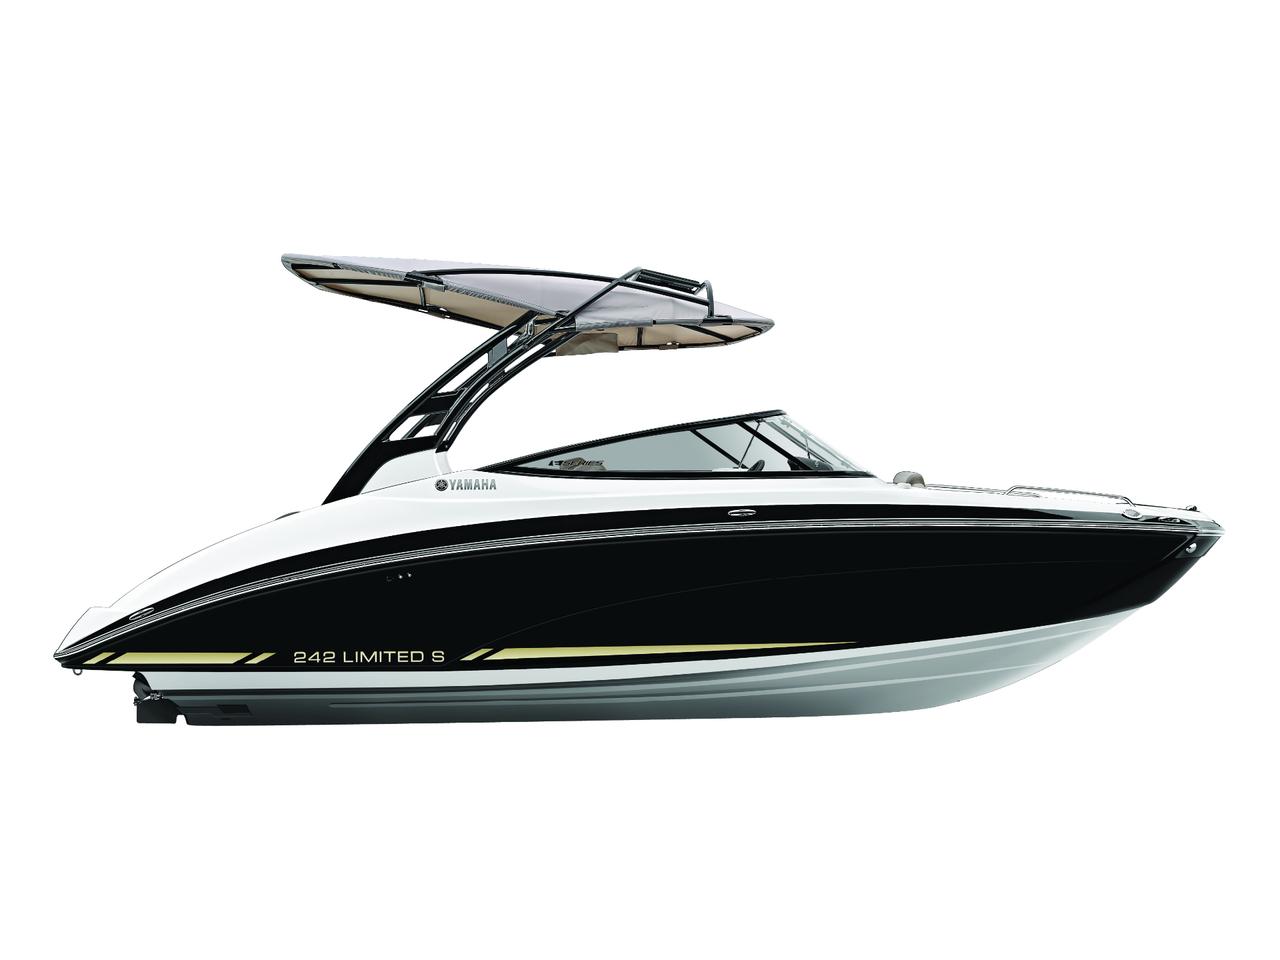 75607.57a9993a8dde3c0458ac4b92.xl Yamaha Limited Wiring Diagram on yamaha limited's, yamaha ar240 high output, yamaha sx240, yamaha super jet, yamaha outboards, yamaha fx cruiser sho, yamaha archery, yamaha fx cruiser ho, yamaha sx 210, yamaha bimini tops and extensions,